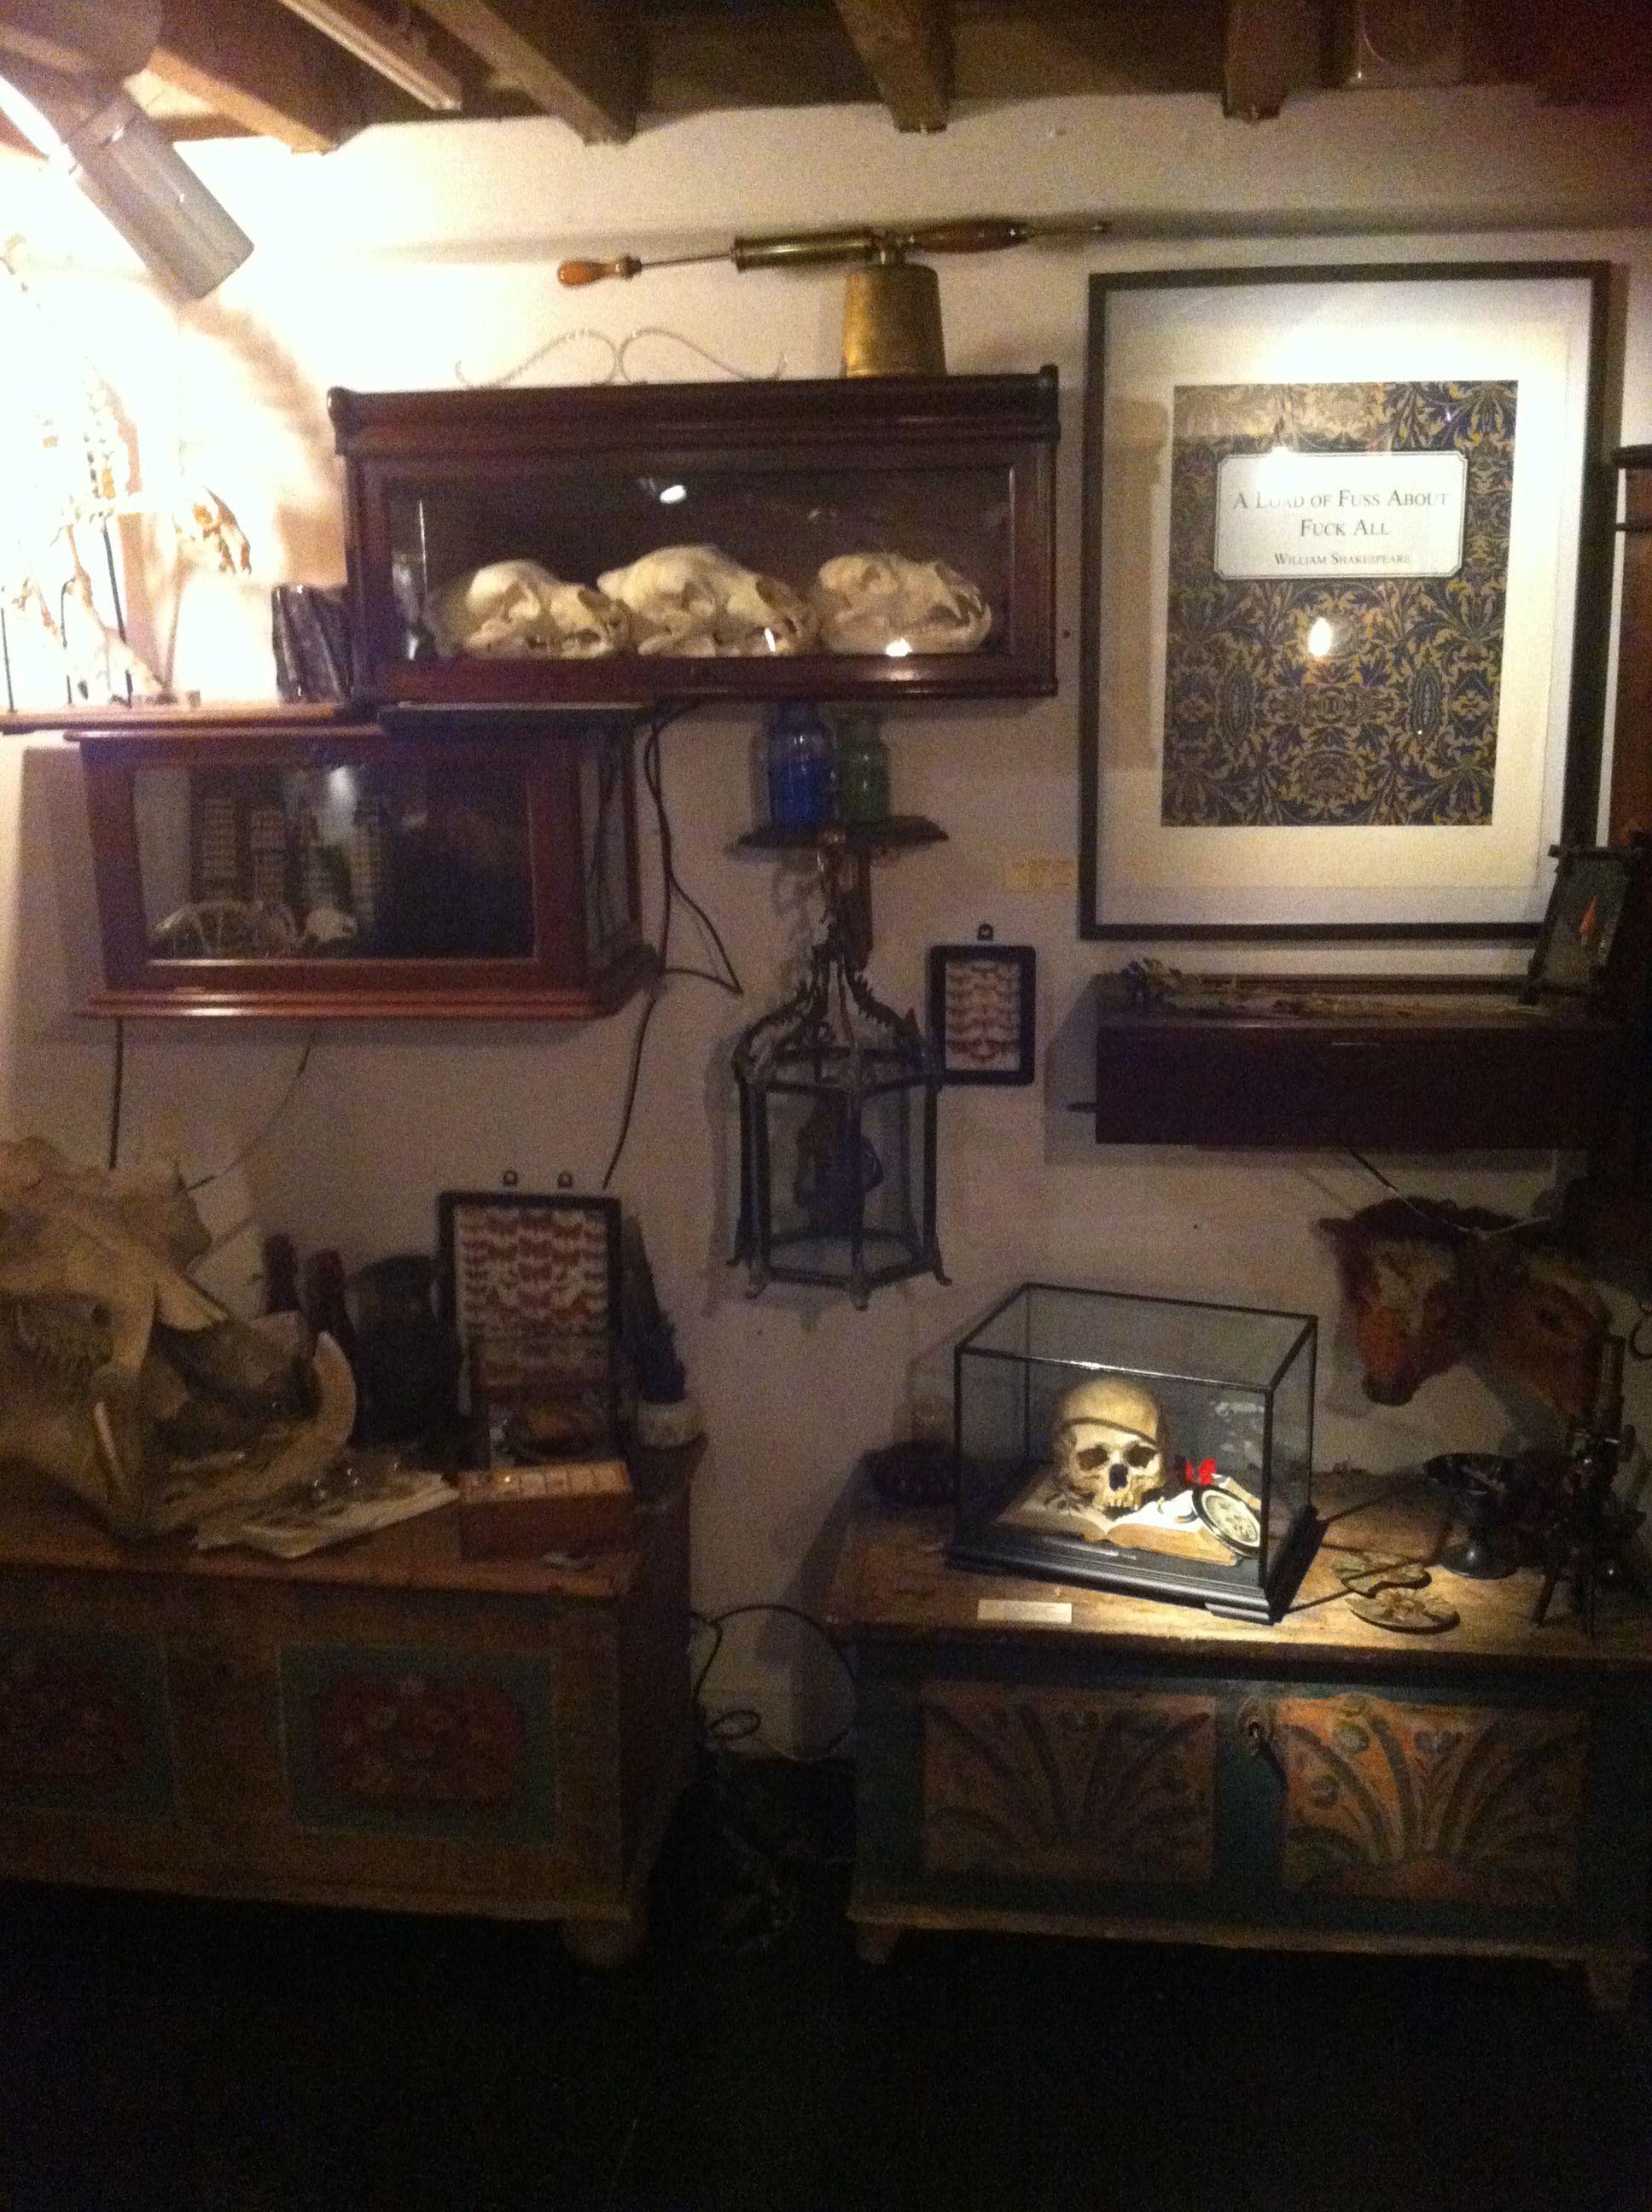 Museum of Wonder basement of PA 15 Bateman Street, Soho